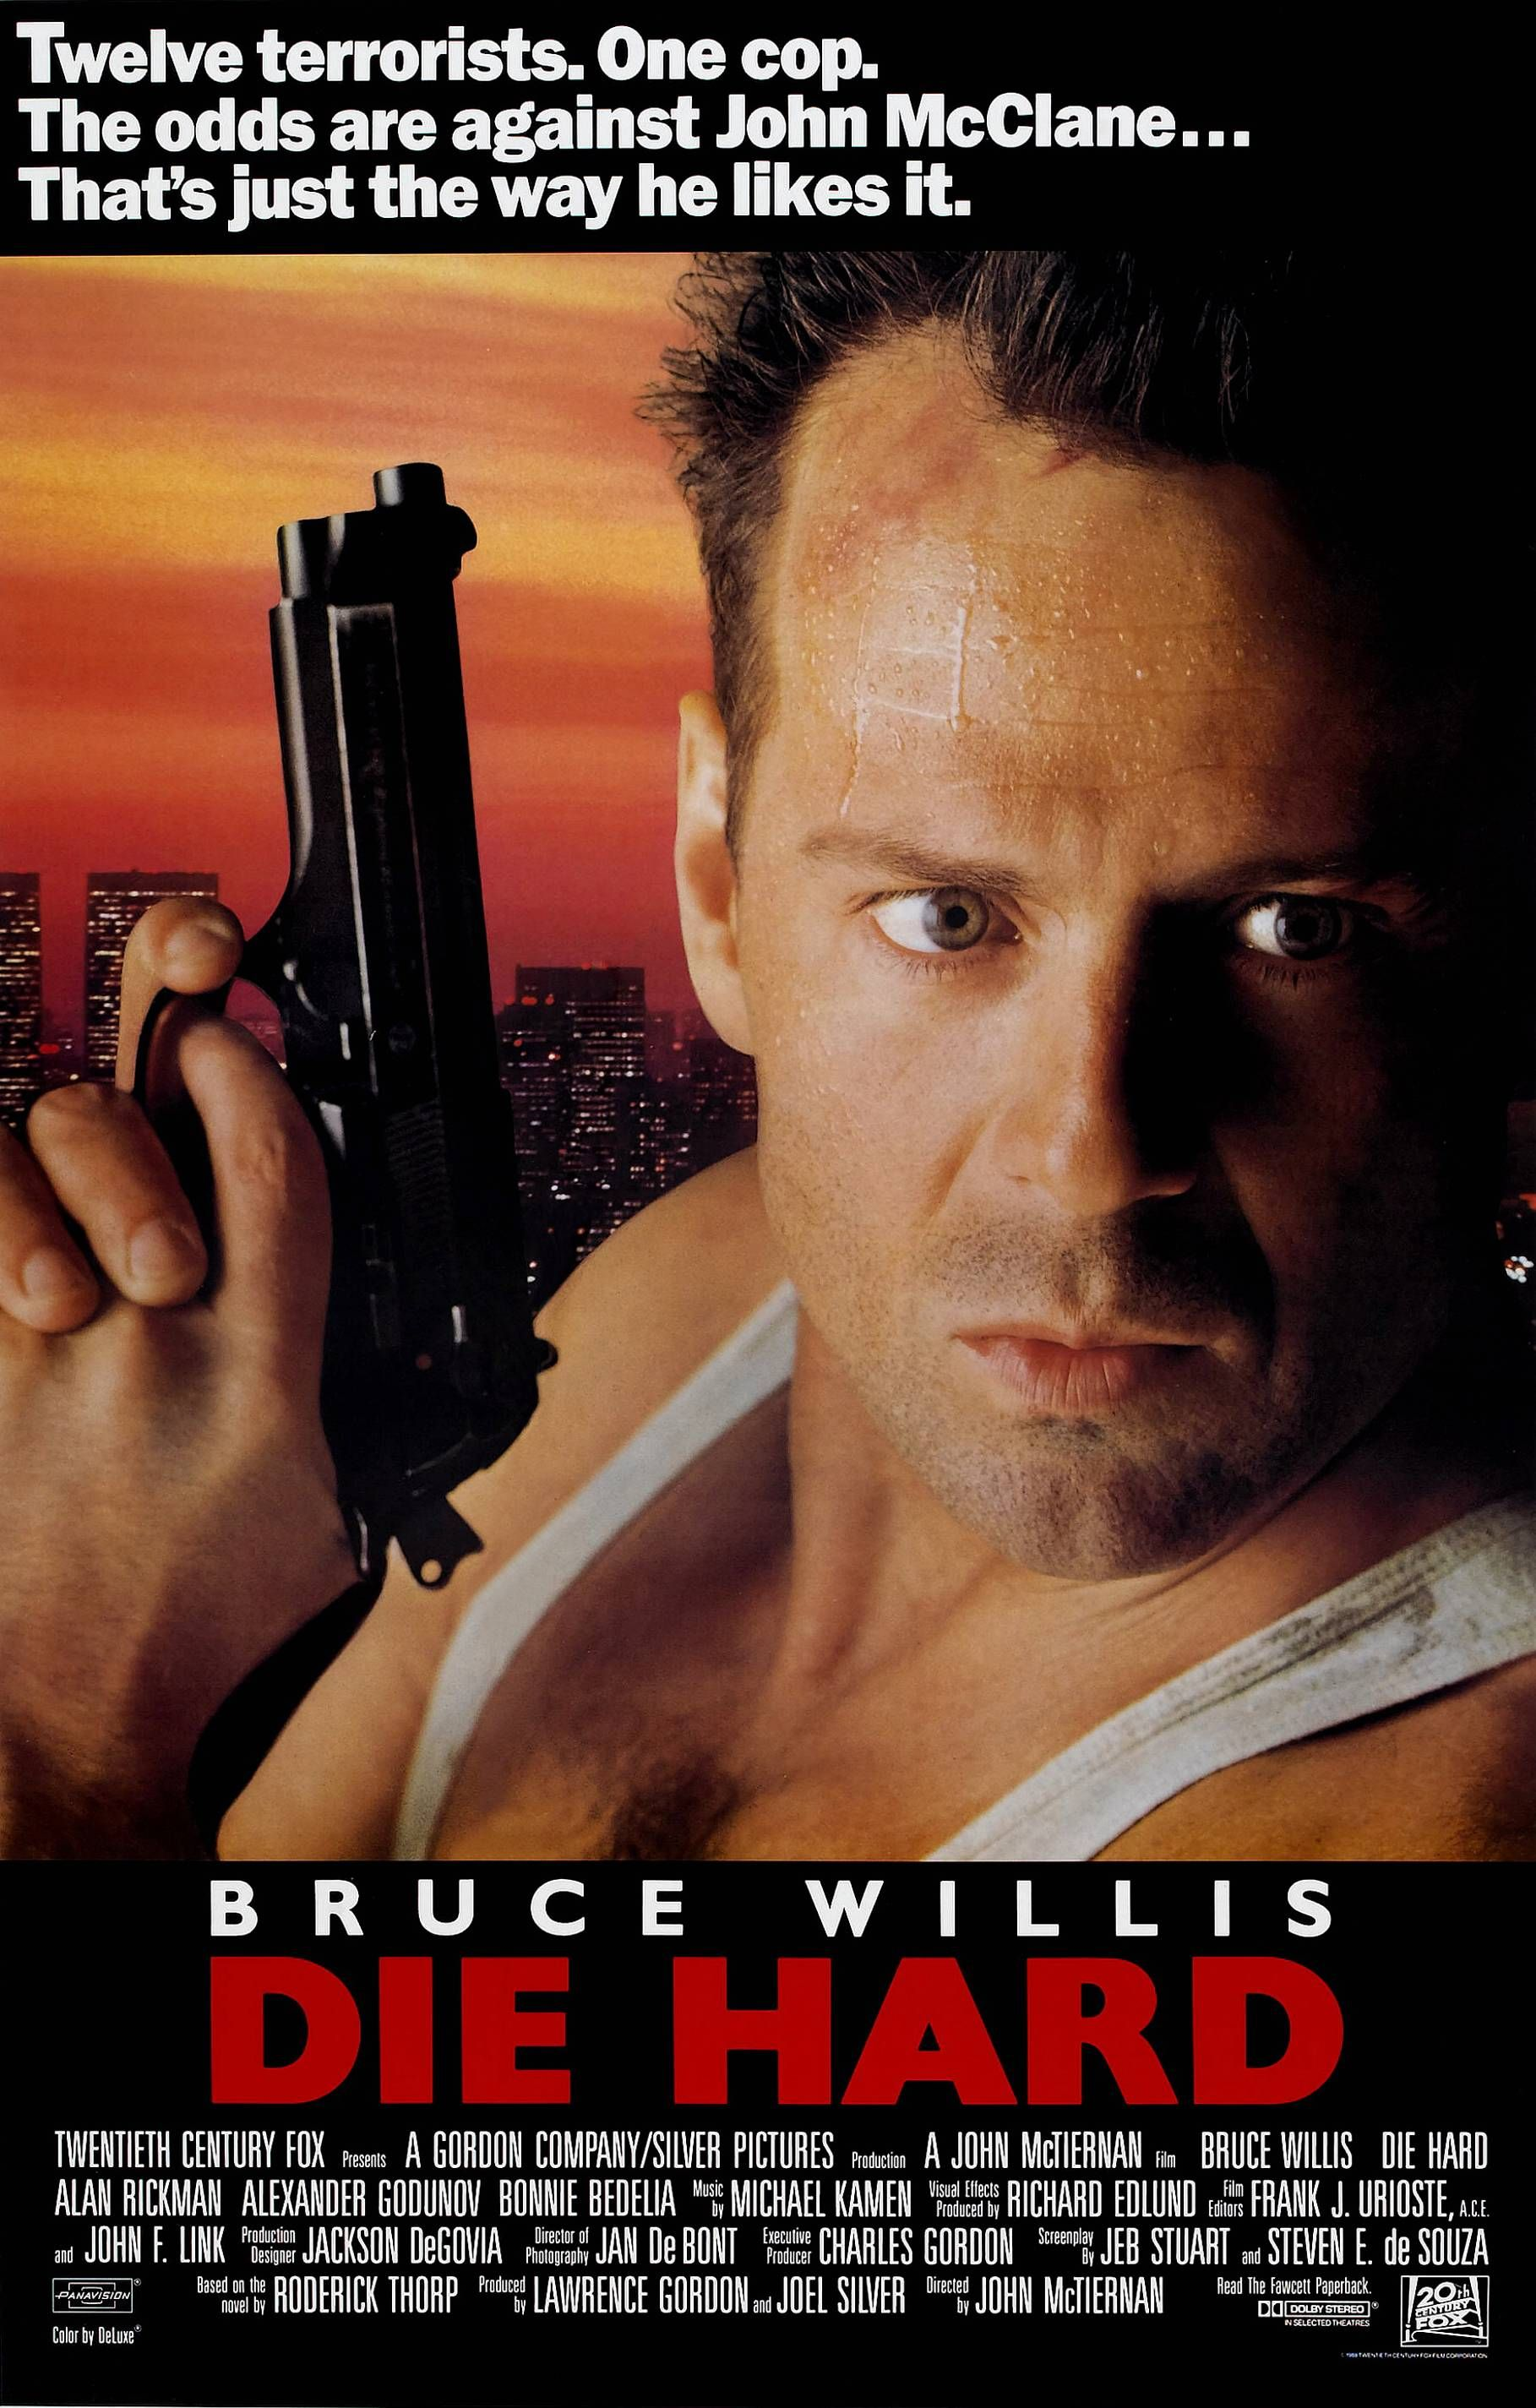 NEW DIE HARD V2 BRUCE WILLIS ORIGINAL 80s 1988 MOVIE CINEMA PRINT PREMIUM POSTER